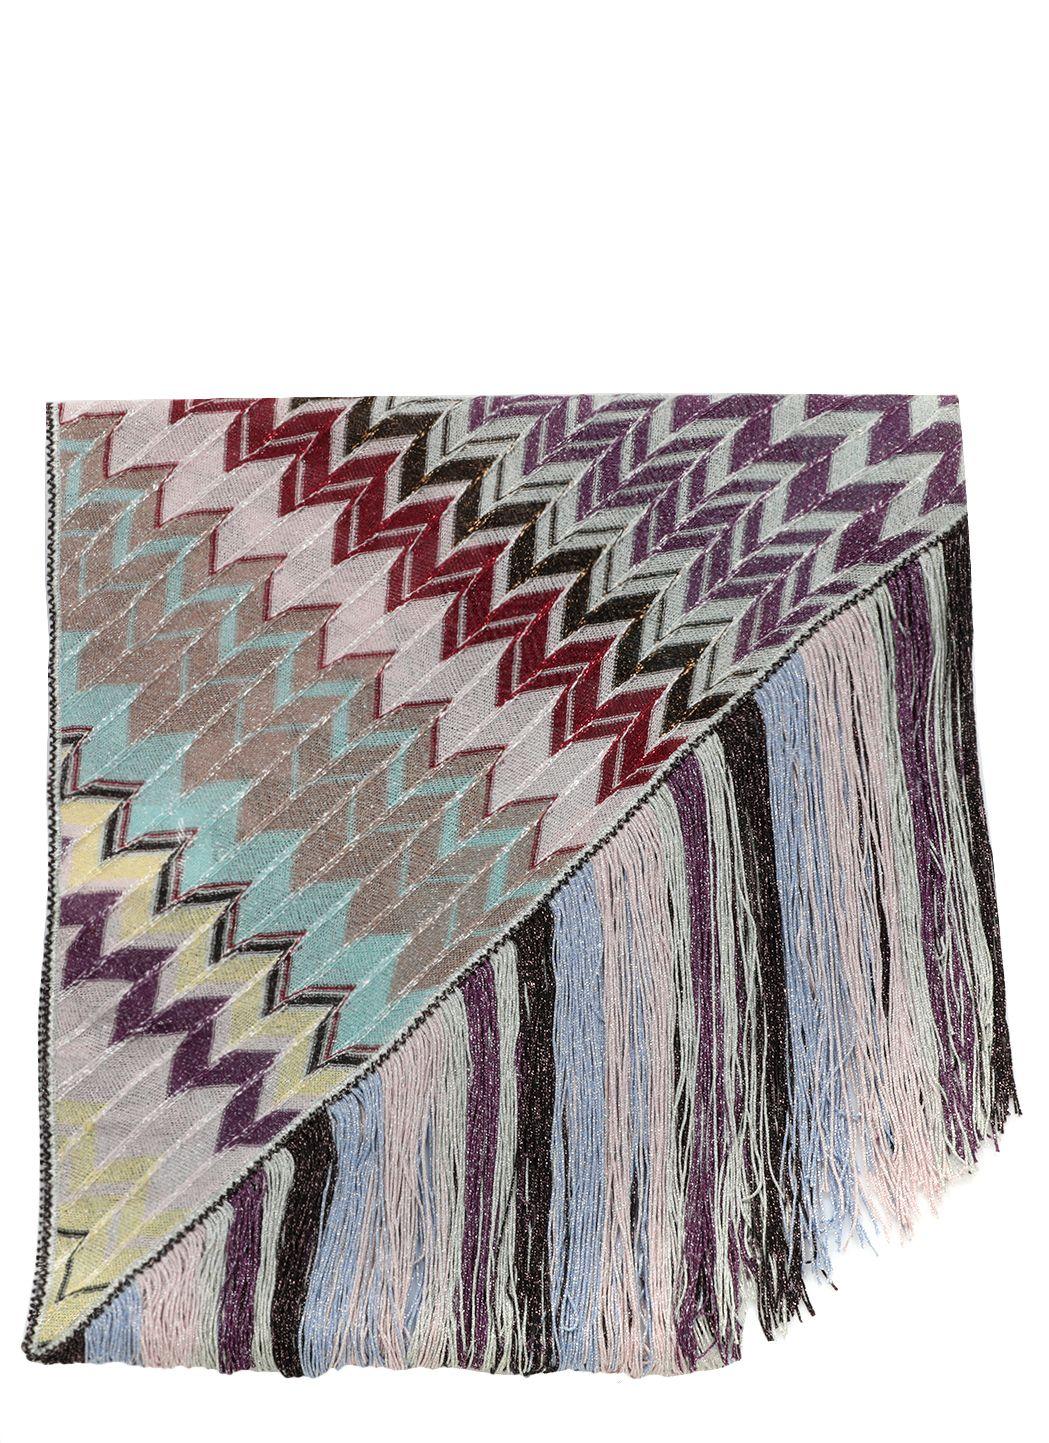 Fabric stole